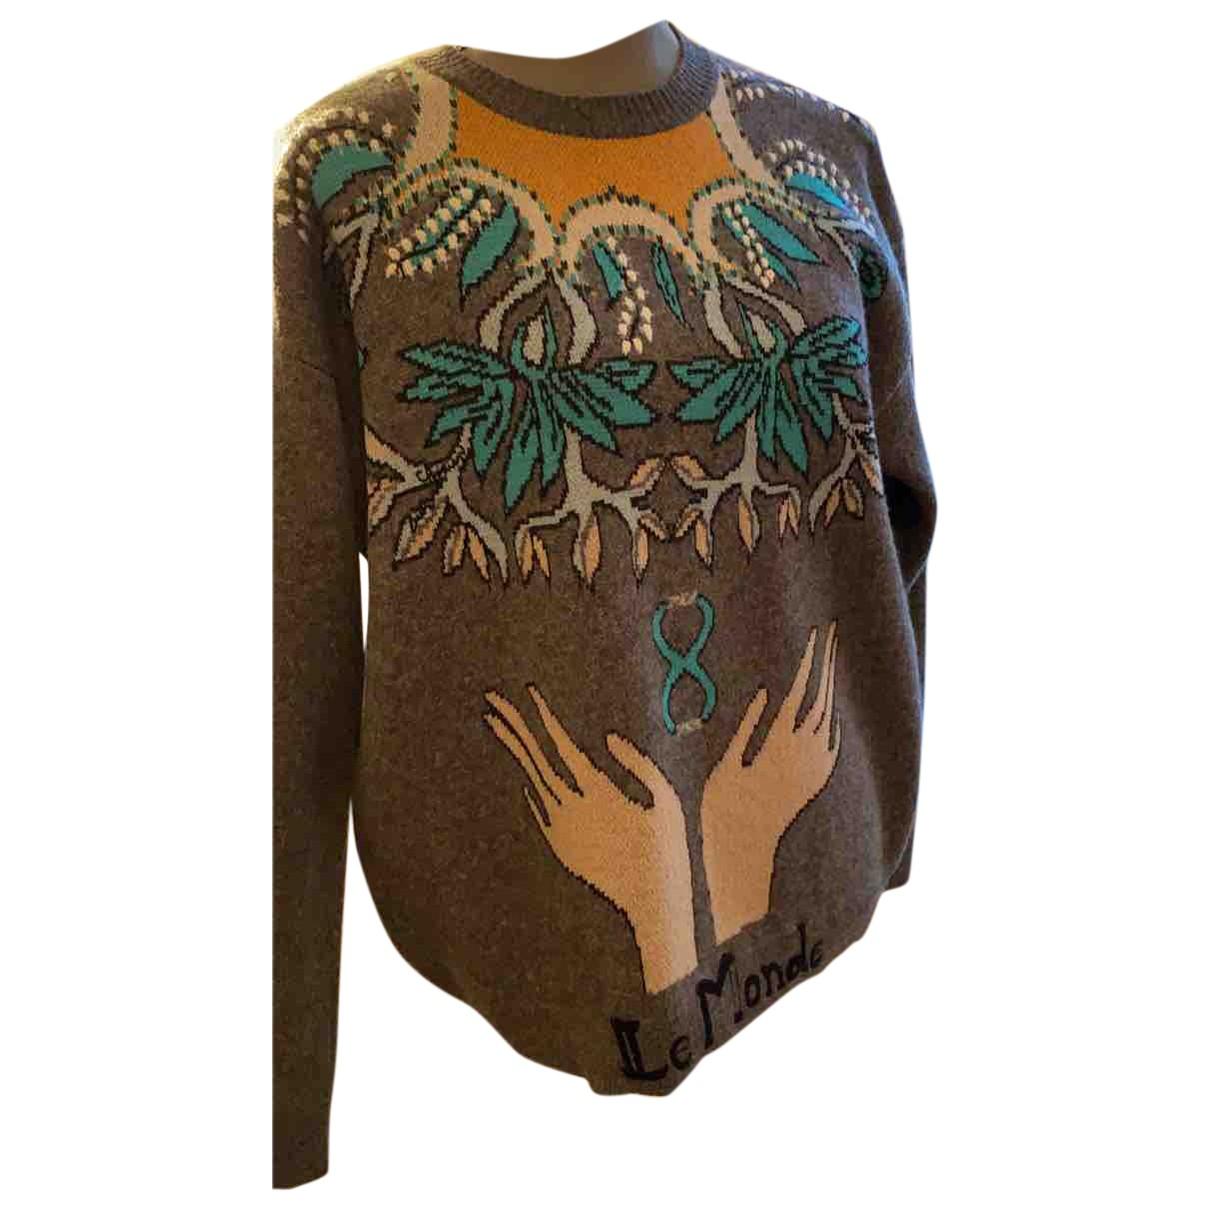 Dior N Multicolour Wool Knitwear for Women 36 FR